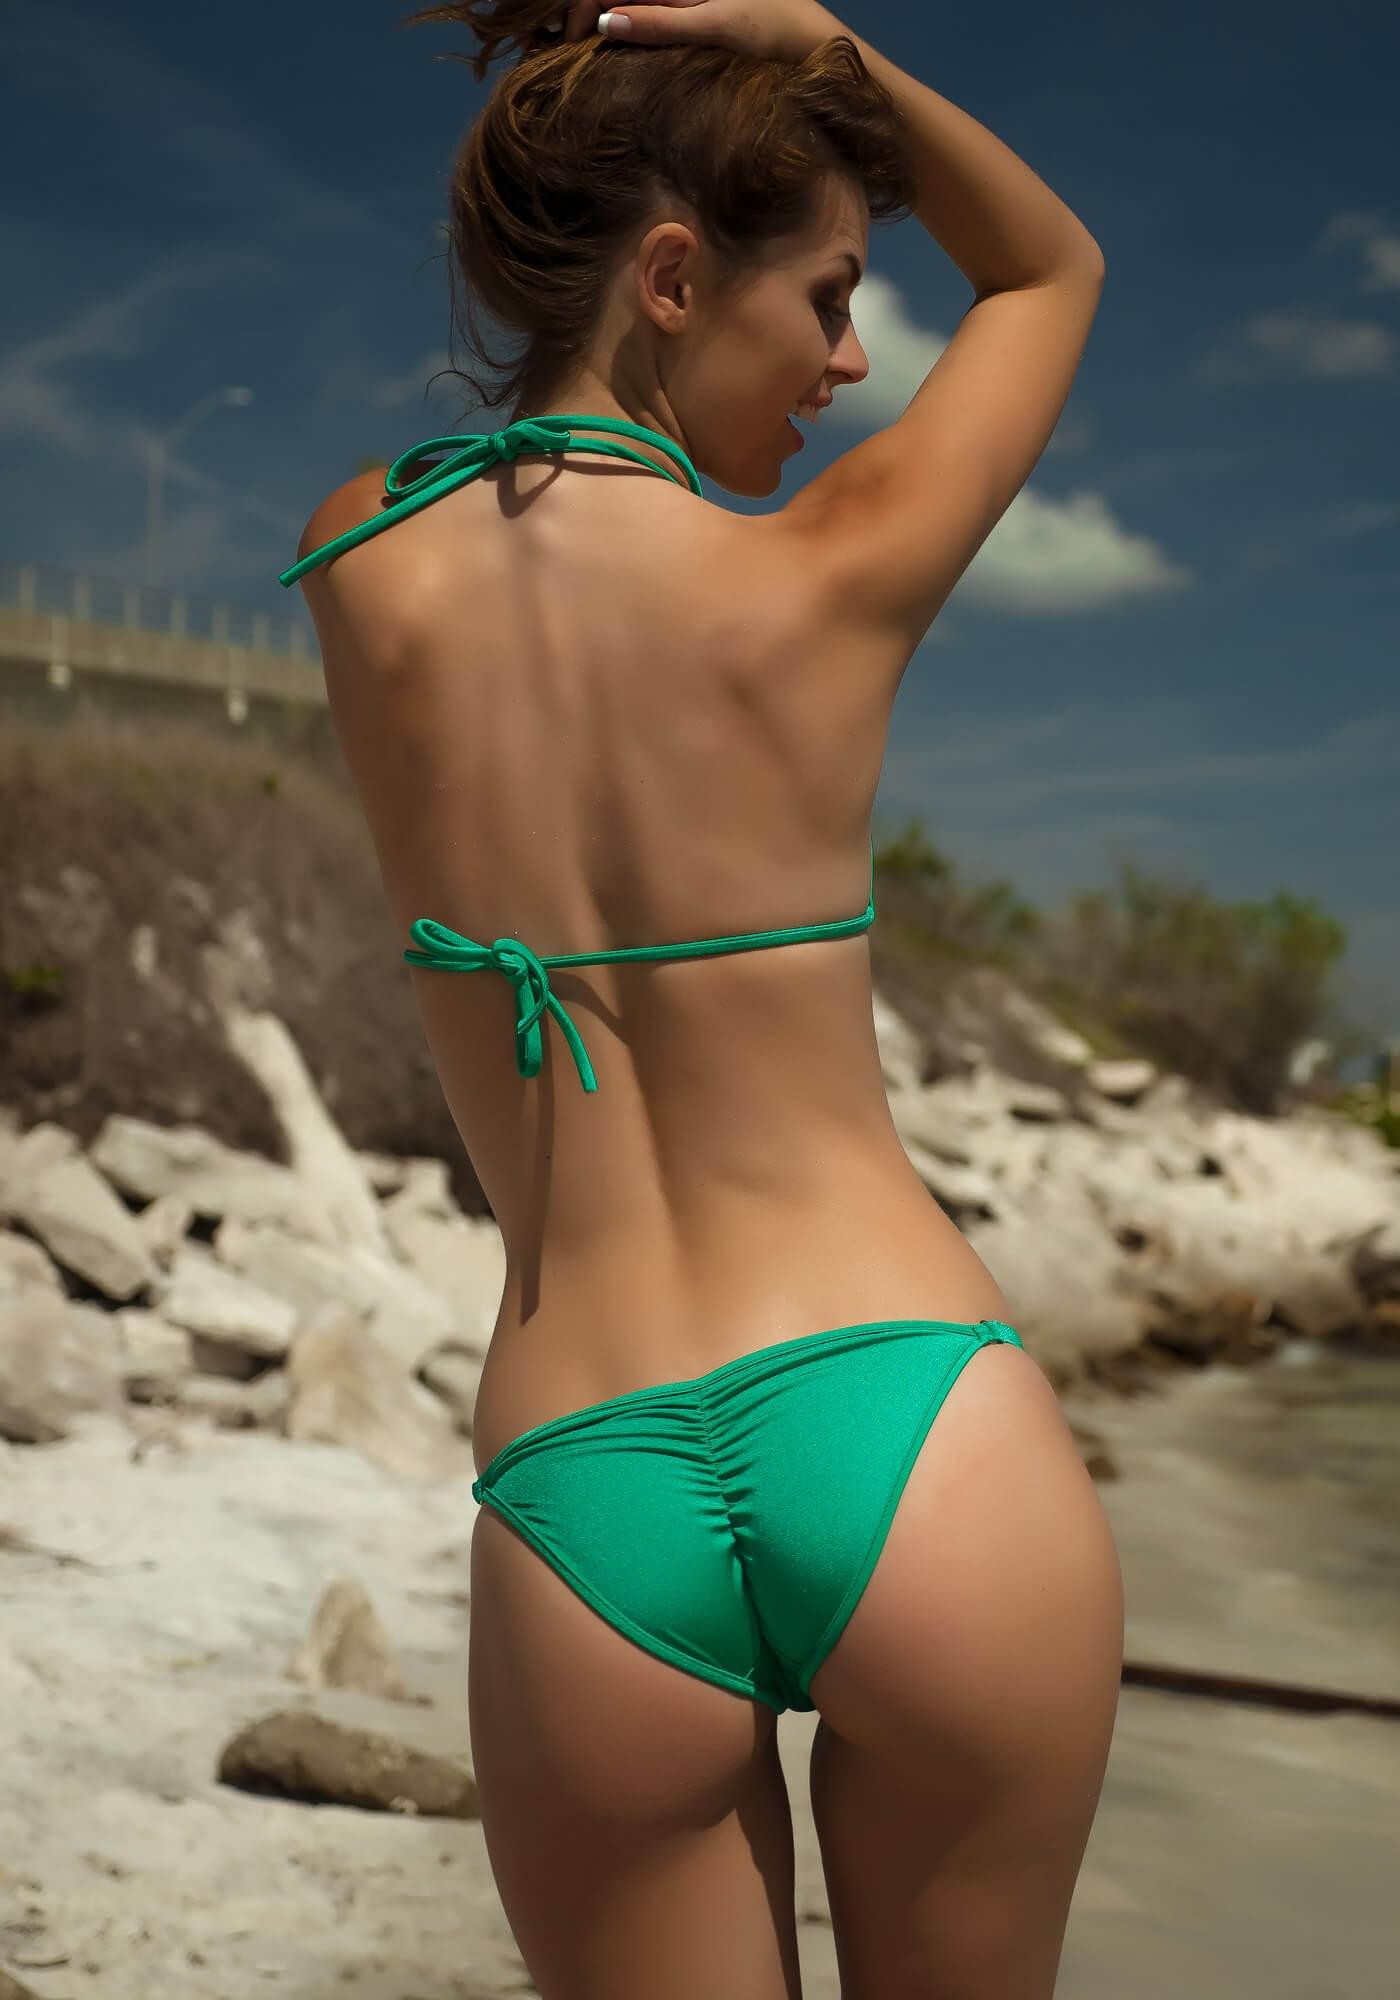 Bikini Booty babe of the day